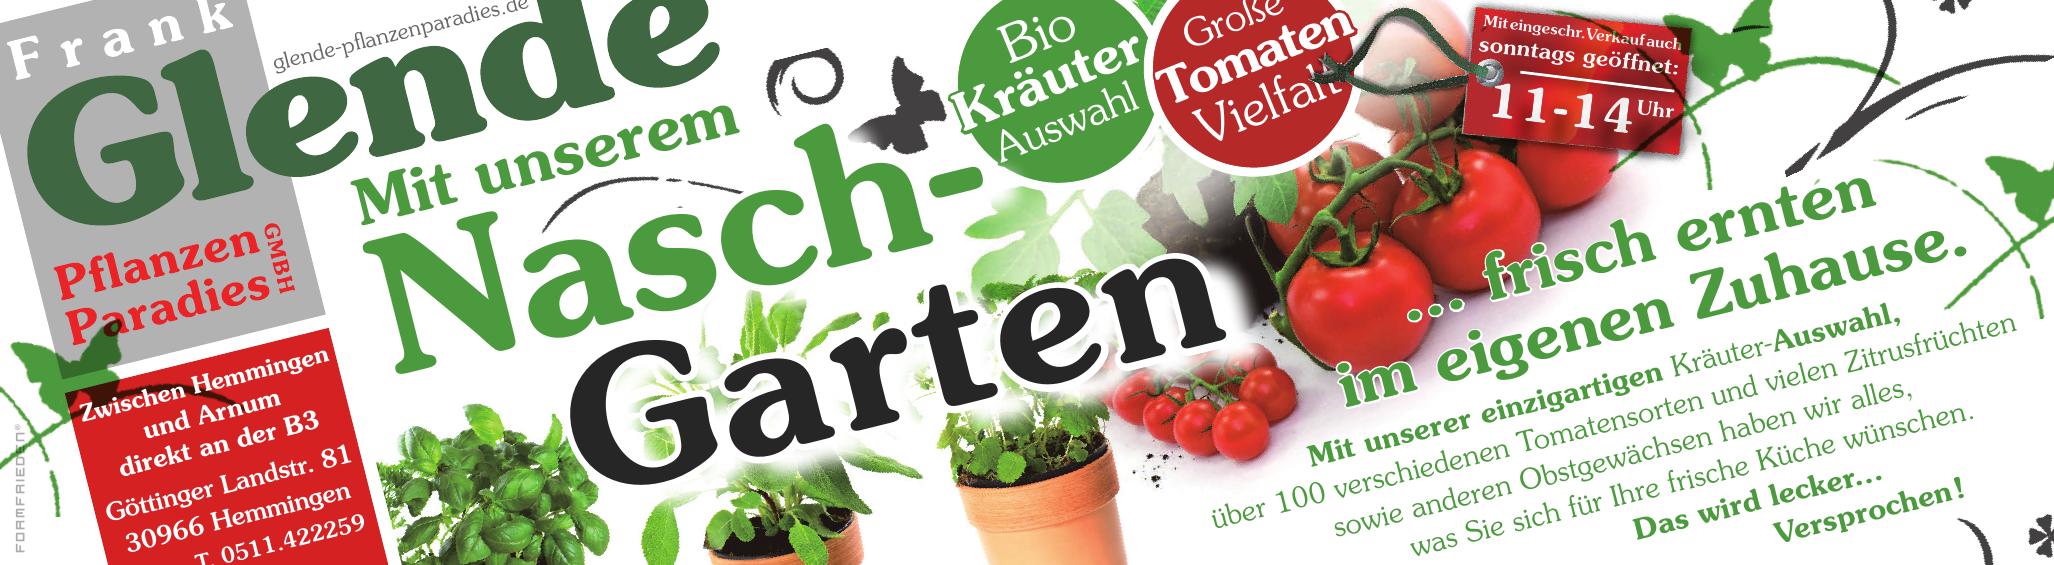 Pflanzen Paradies GmbH